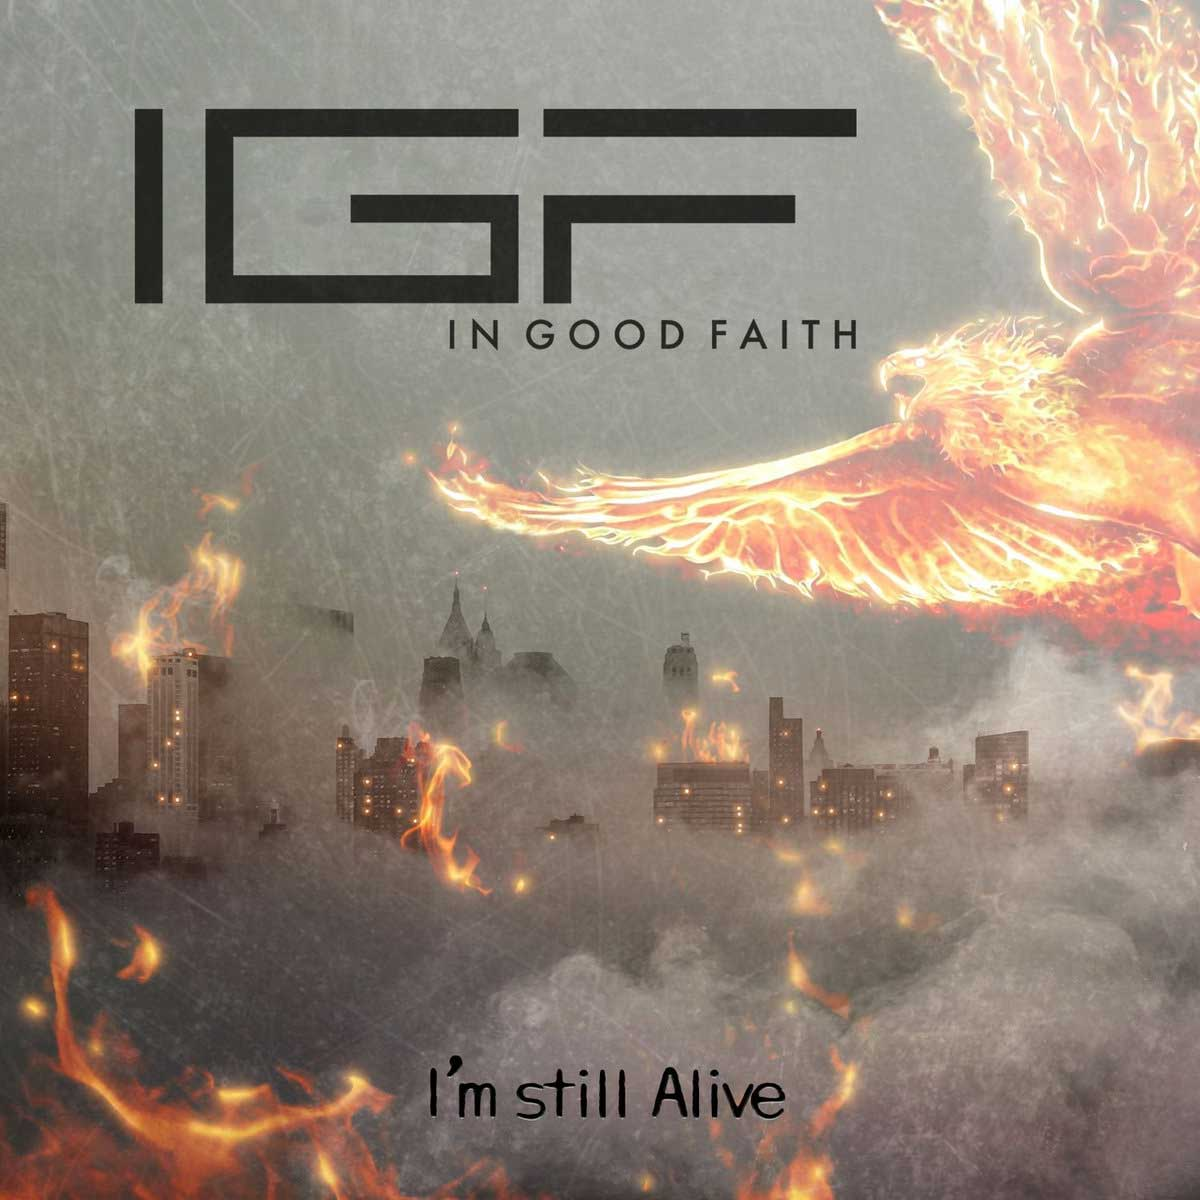 In Good Faith - I'm Still Alive - In Good Faith - I'm Still Alive